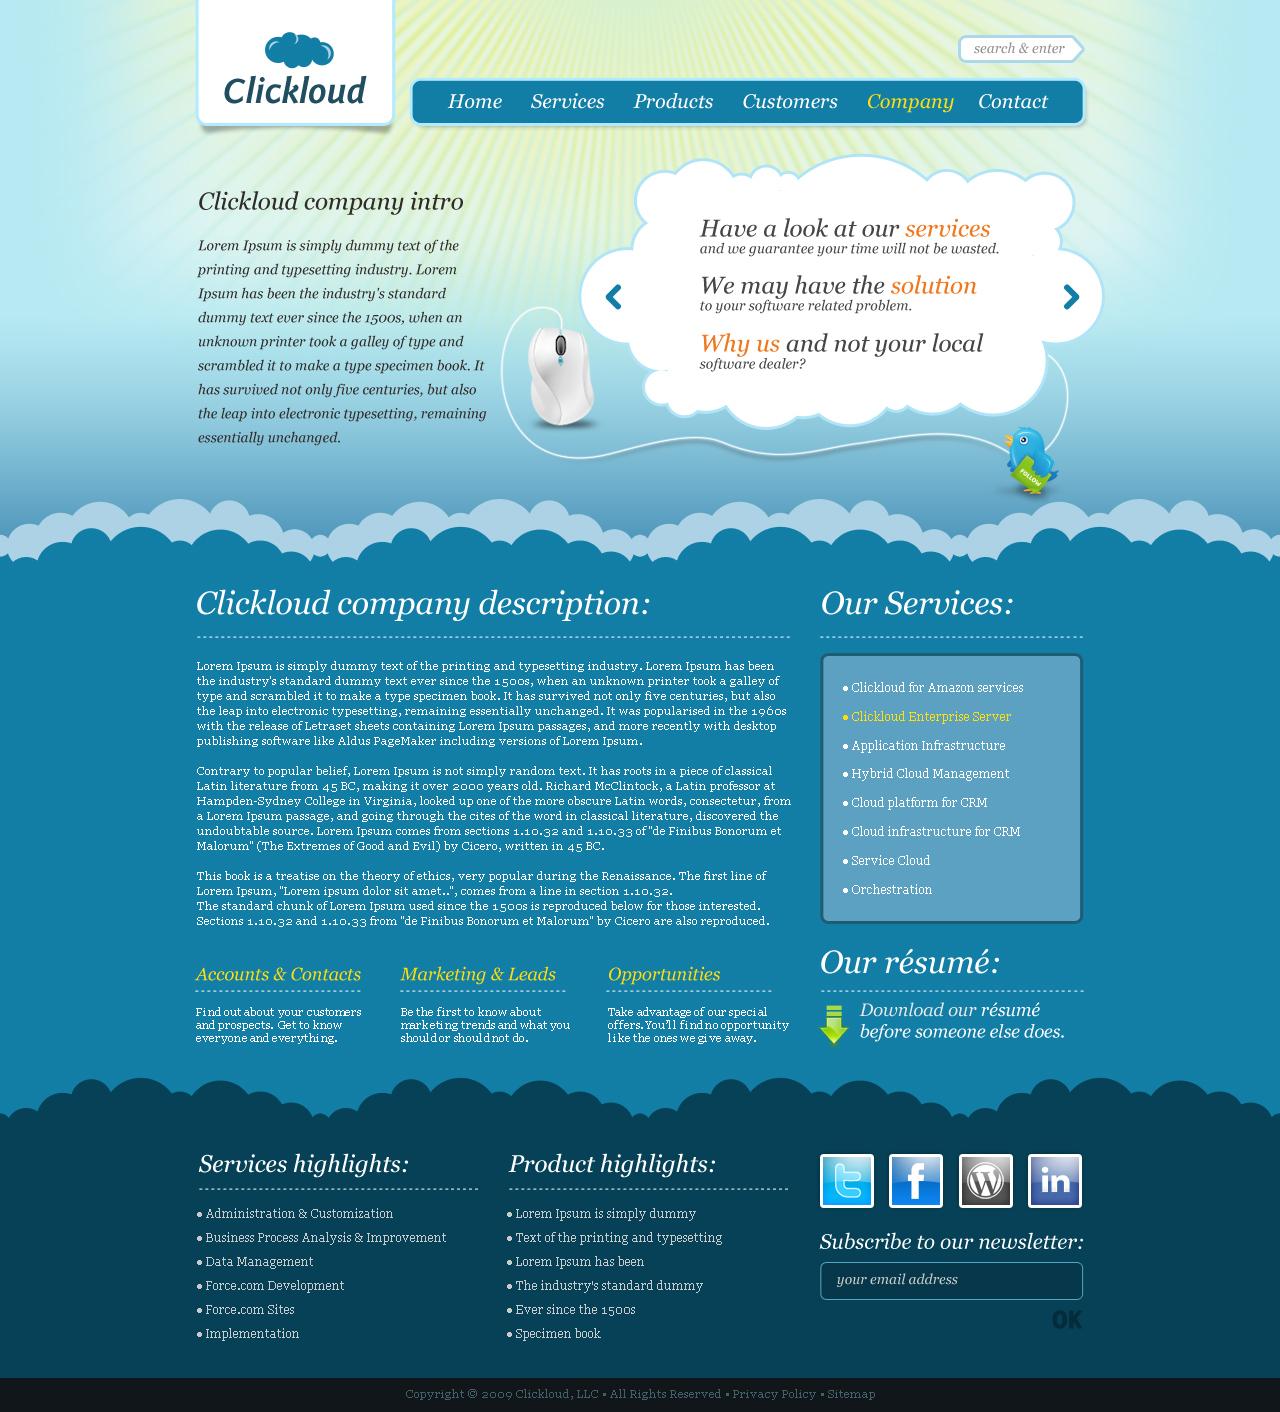 Clickloud Web 2.0 Business Template